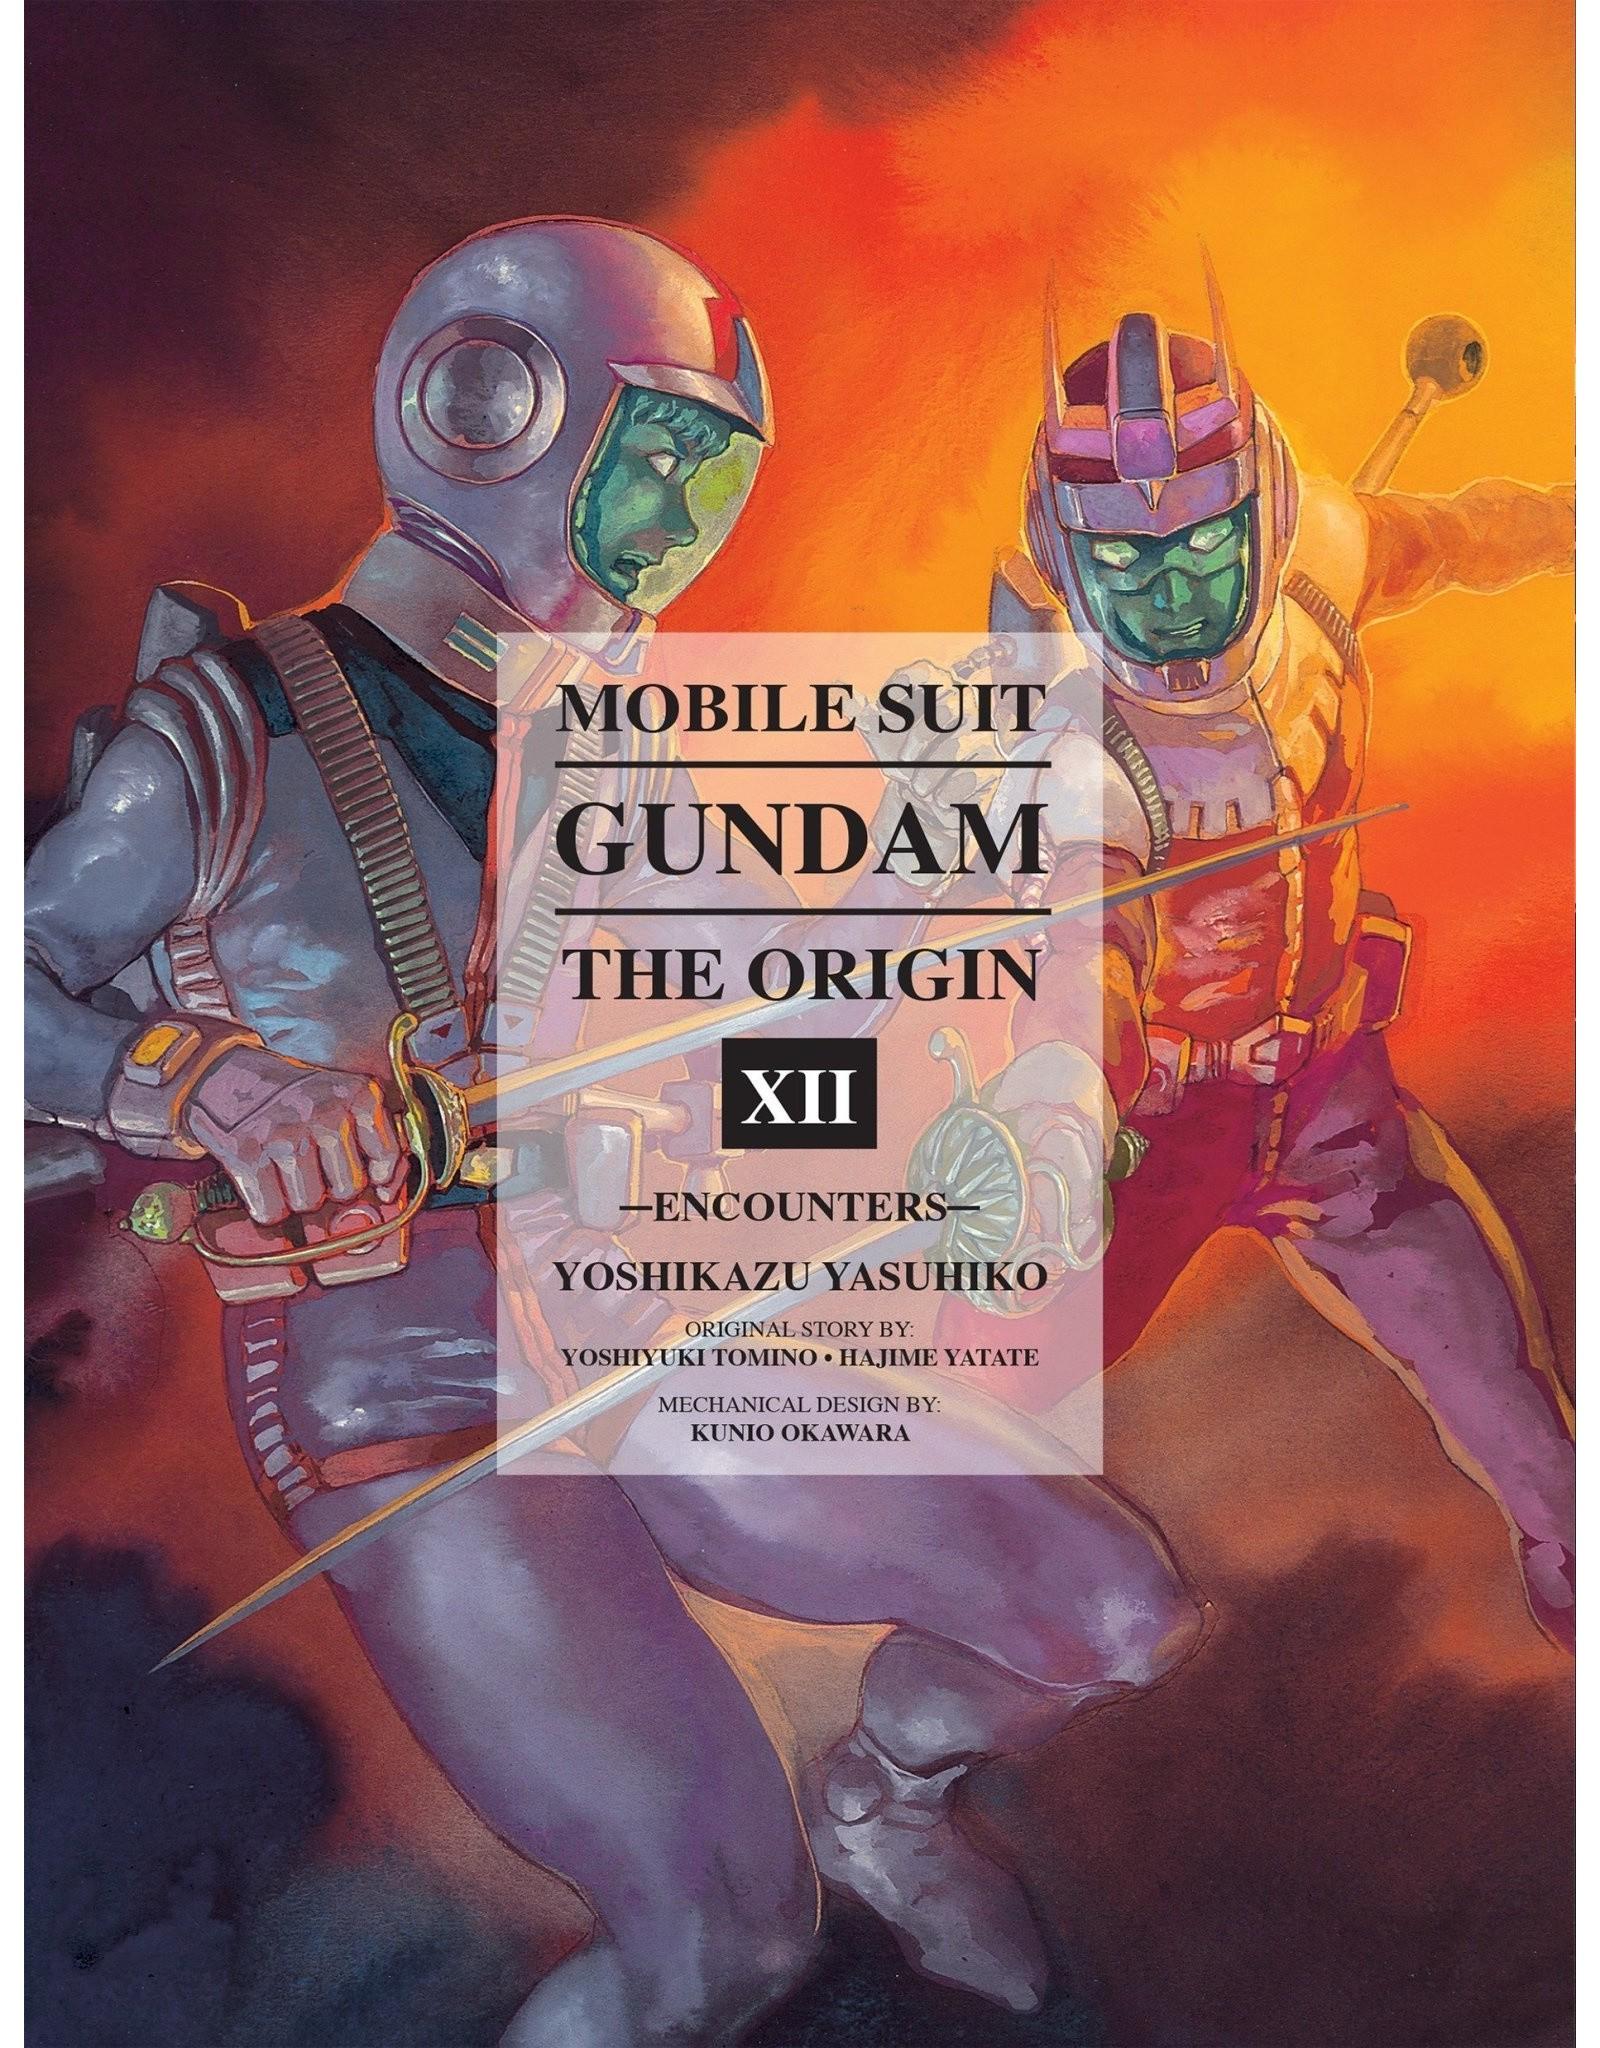 Mobile Suit Gundam: The Origin XII (English Version)